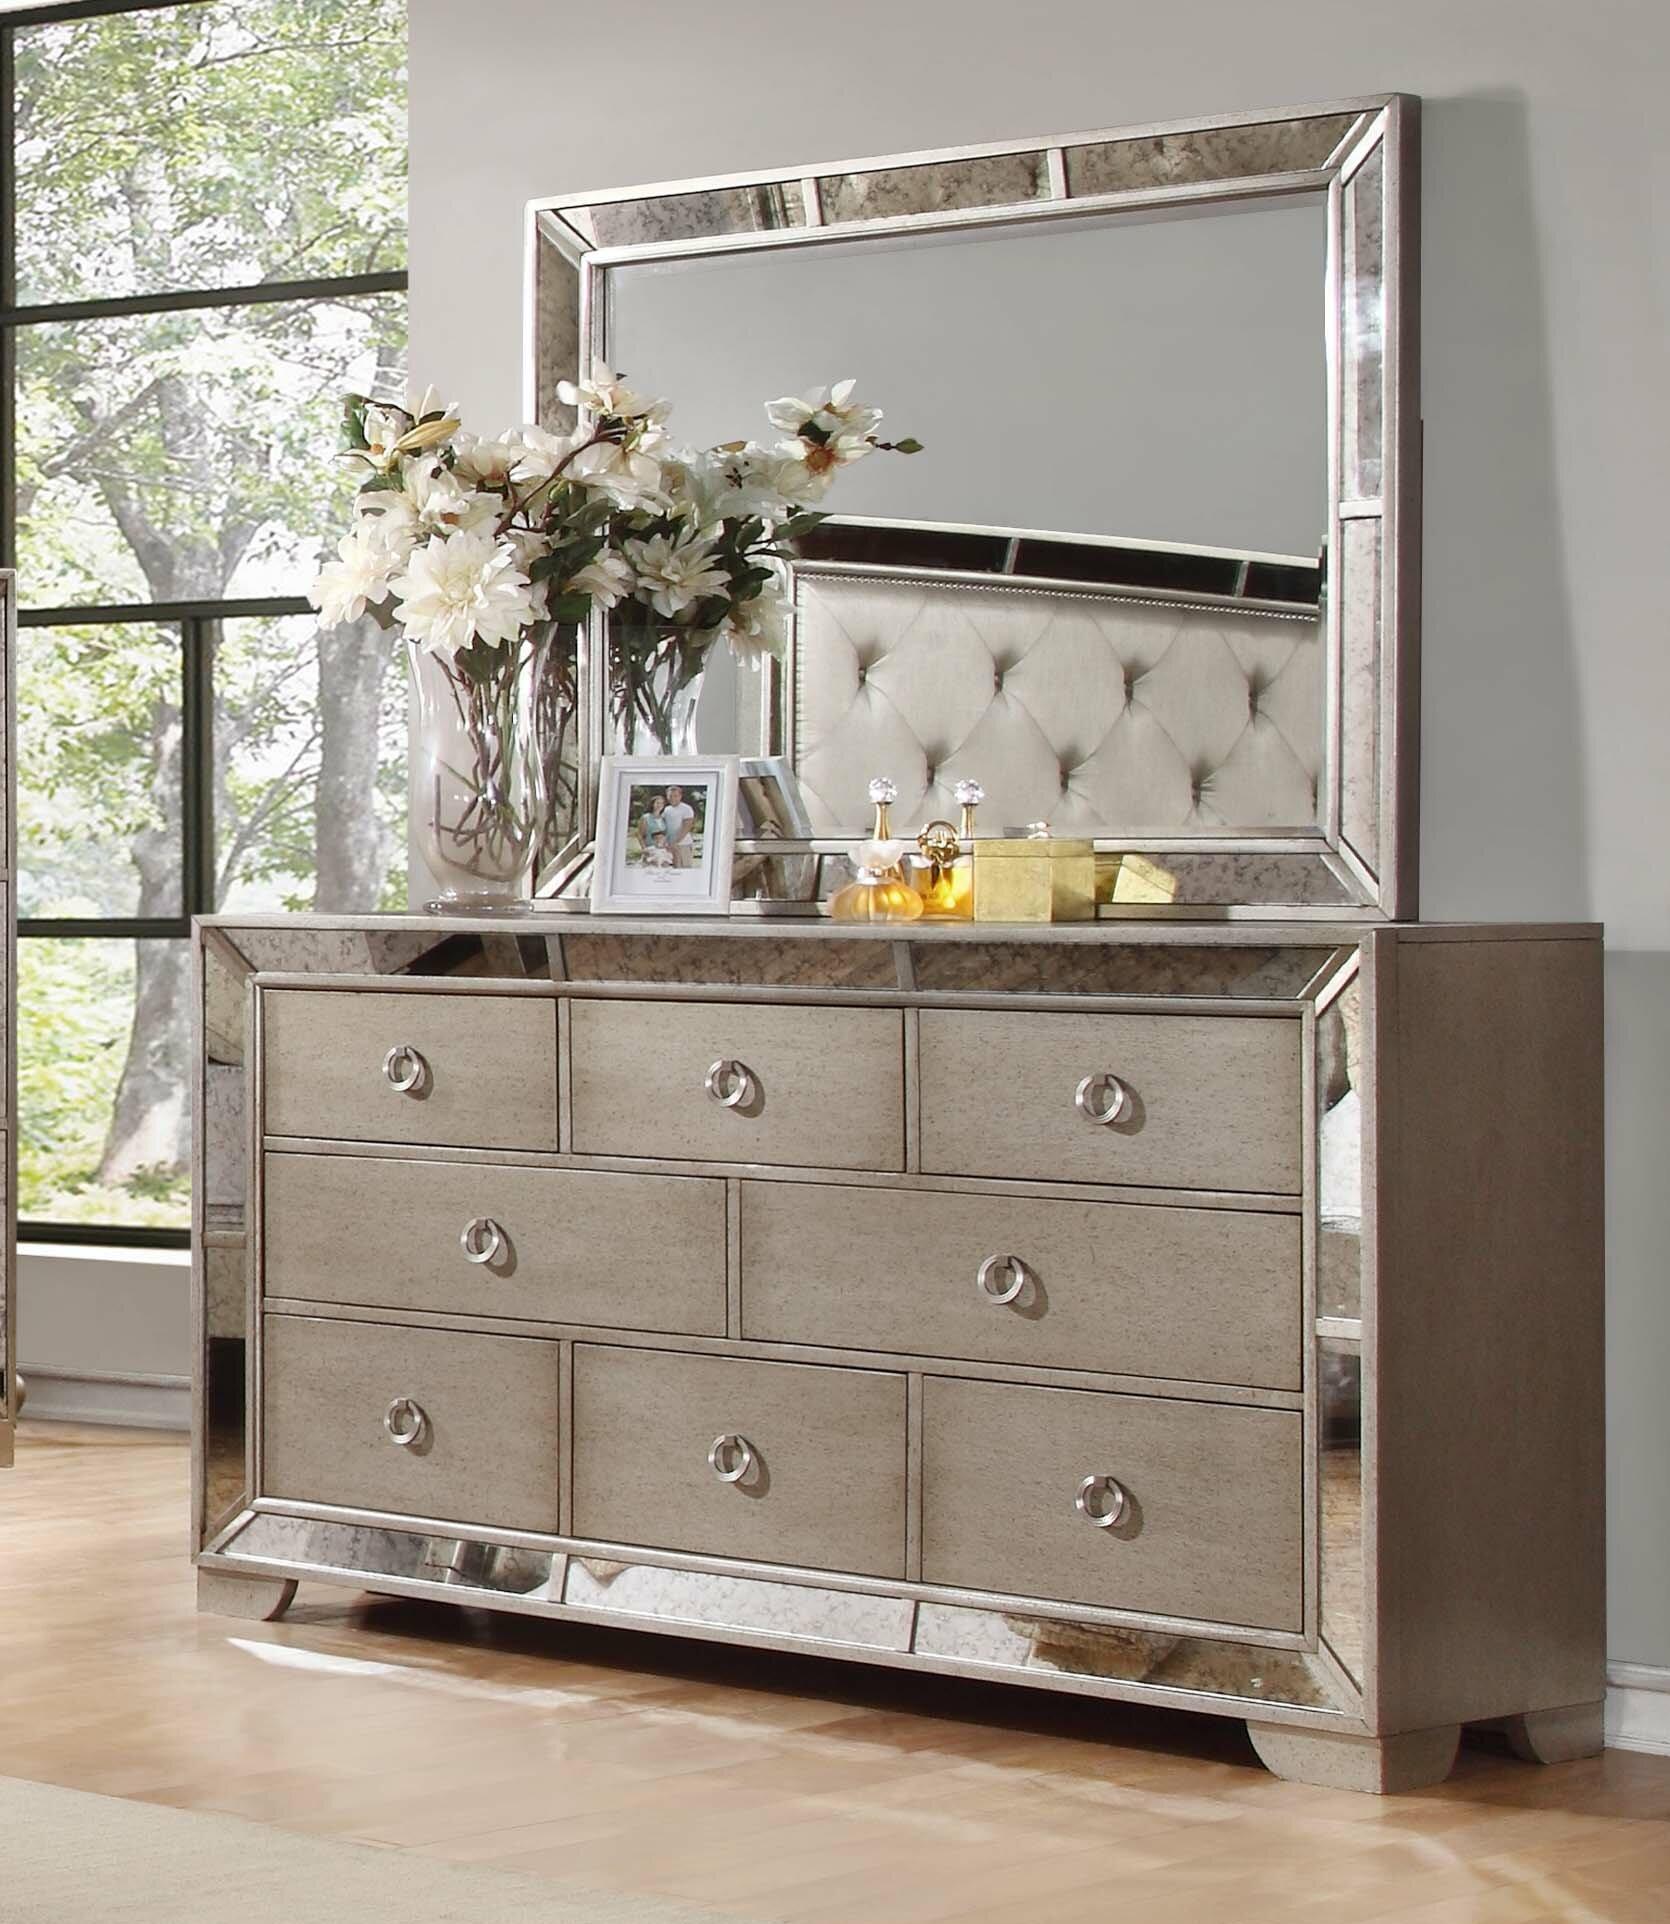 Willa Arlo Interiors Dowson 8 Drawer Dresser With Mirror Reviews